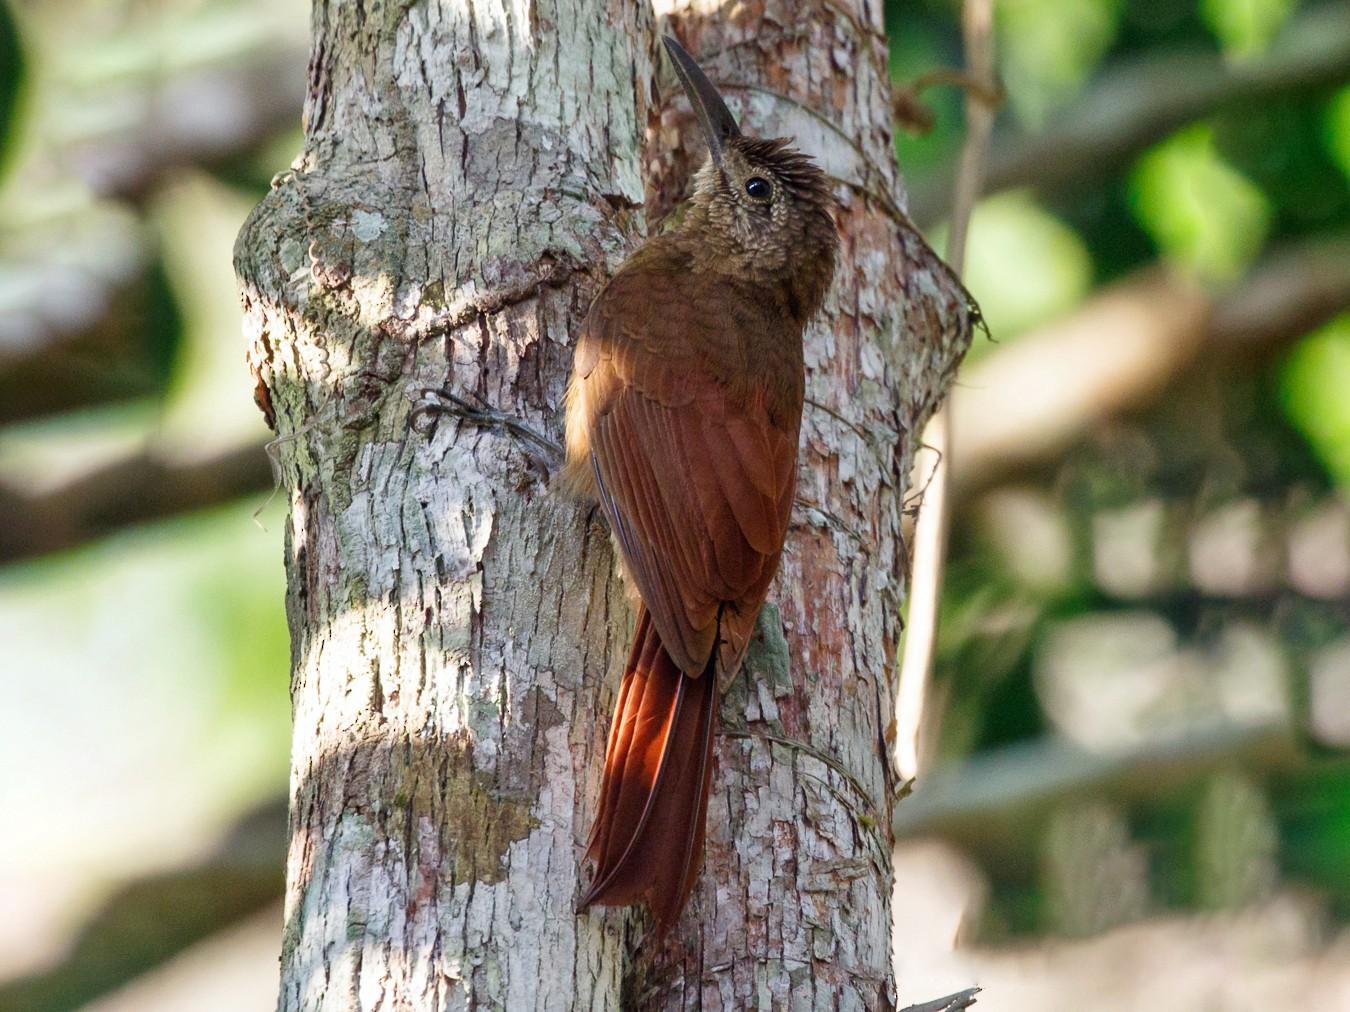 Amazonian Barred-Woodcreeper - Silvia Faustino Linhares